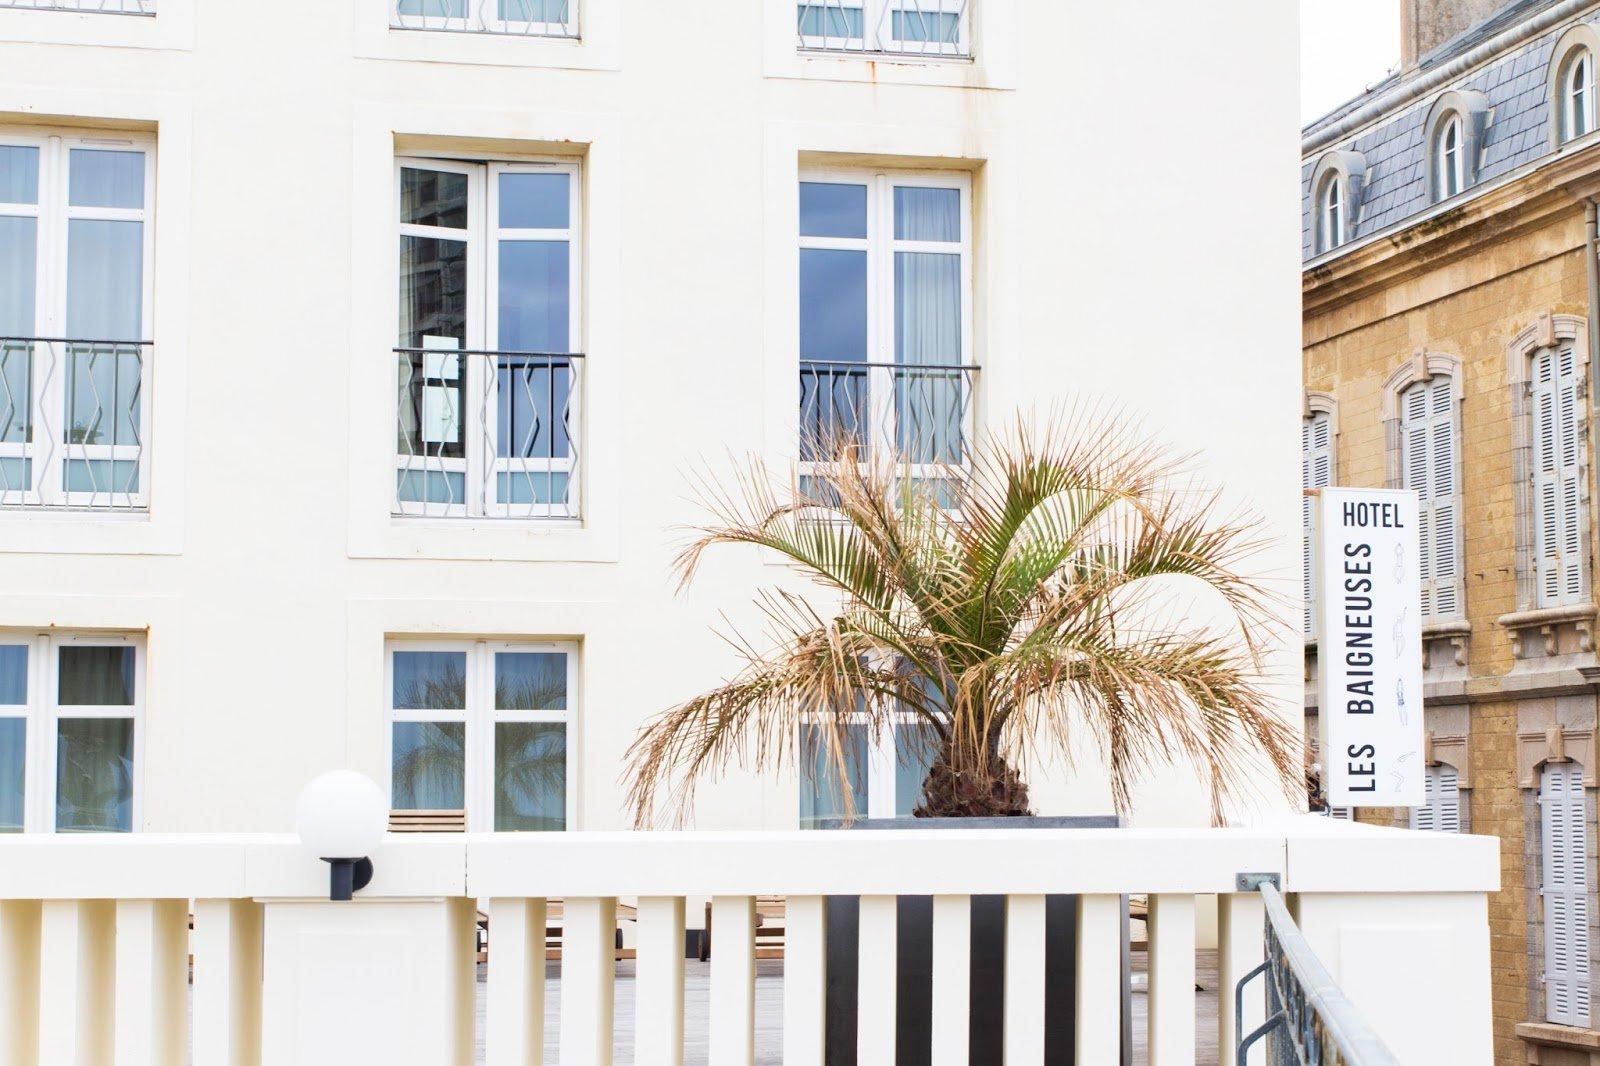 Les Baigneuses Biarritz